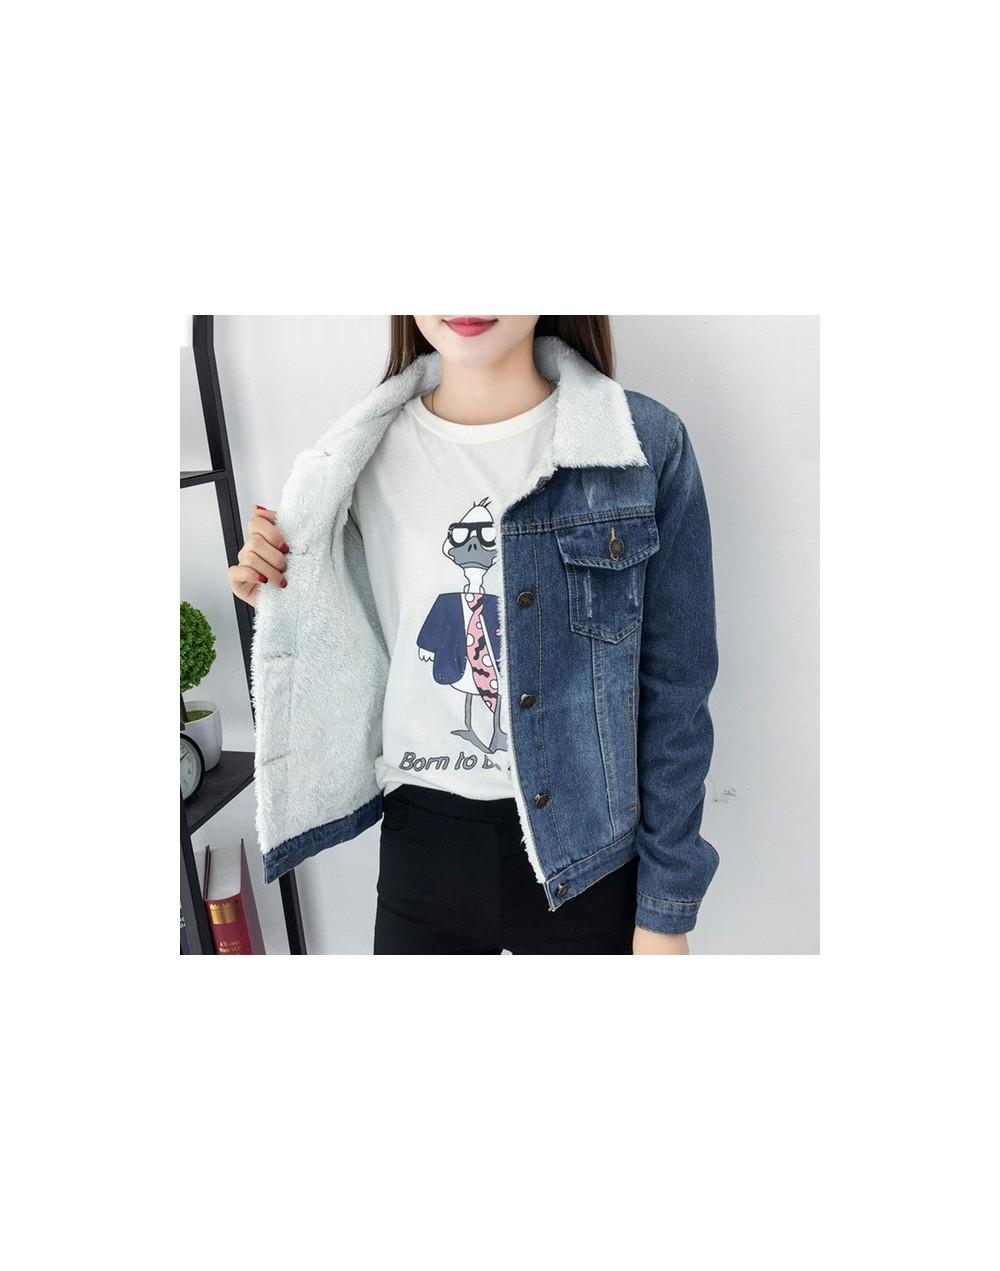 2019 Winter New Large Size 4XL Women's Cotton Coat Plus Velvet Thickening Thin Fashion Lamb Hair Denim Jacket Jeans Female C...